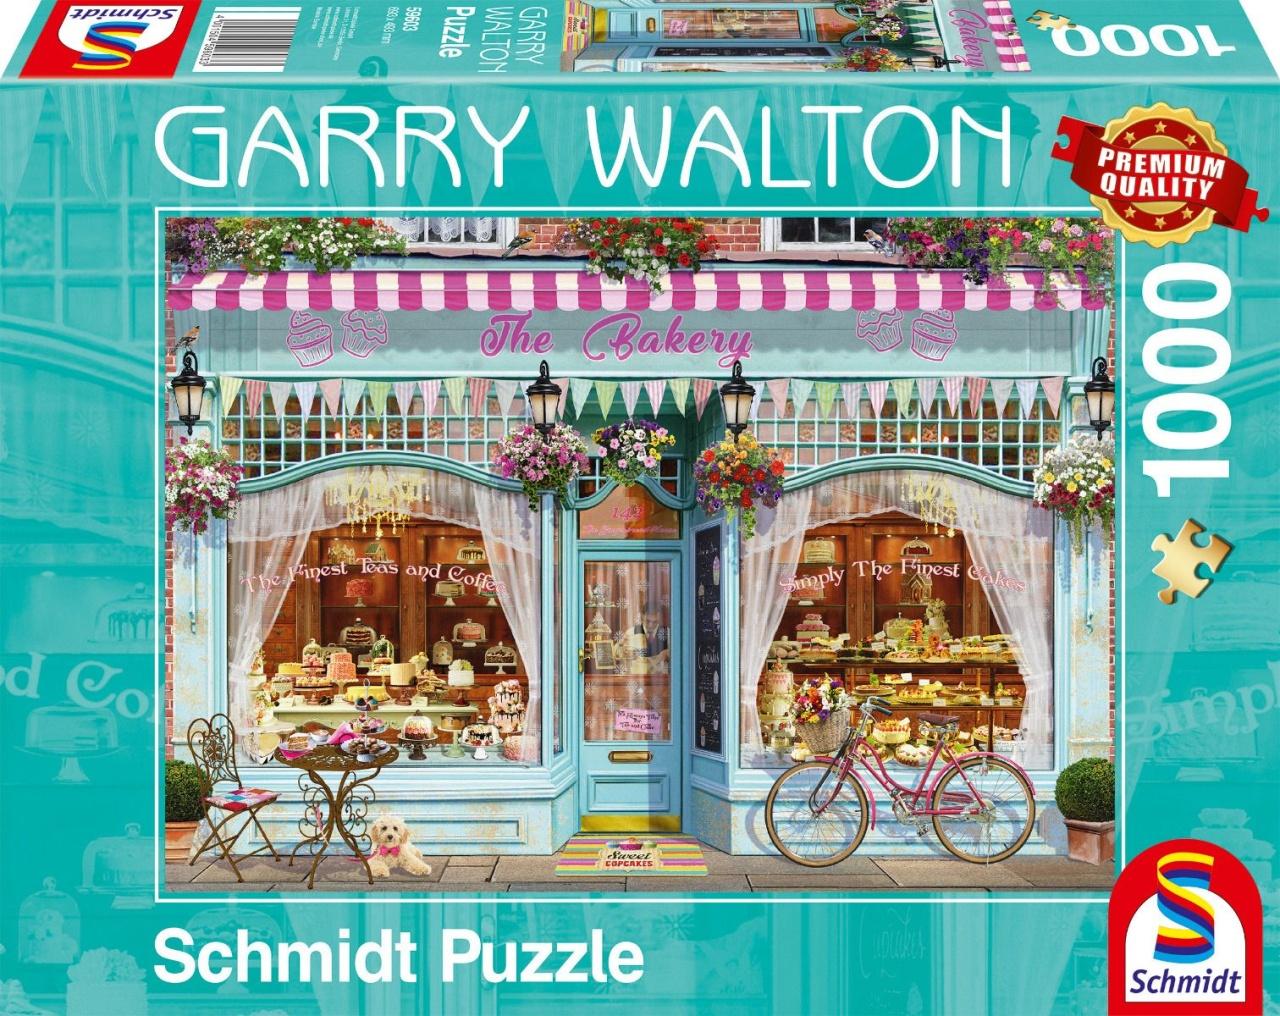 Schmidt Spiele Puzzle Garry Walton Bäckerei 1000 Teile